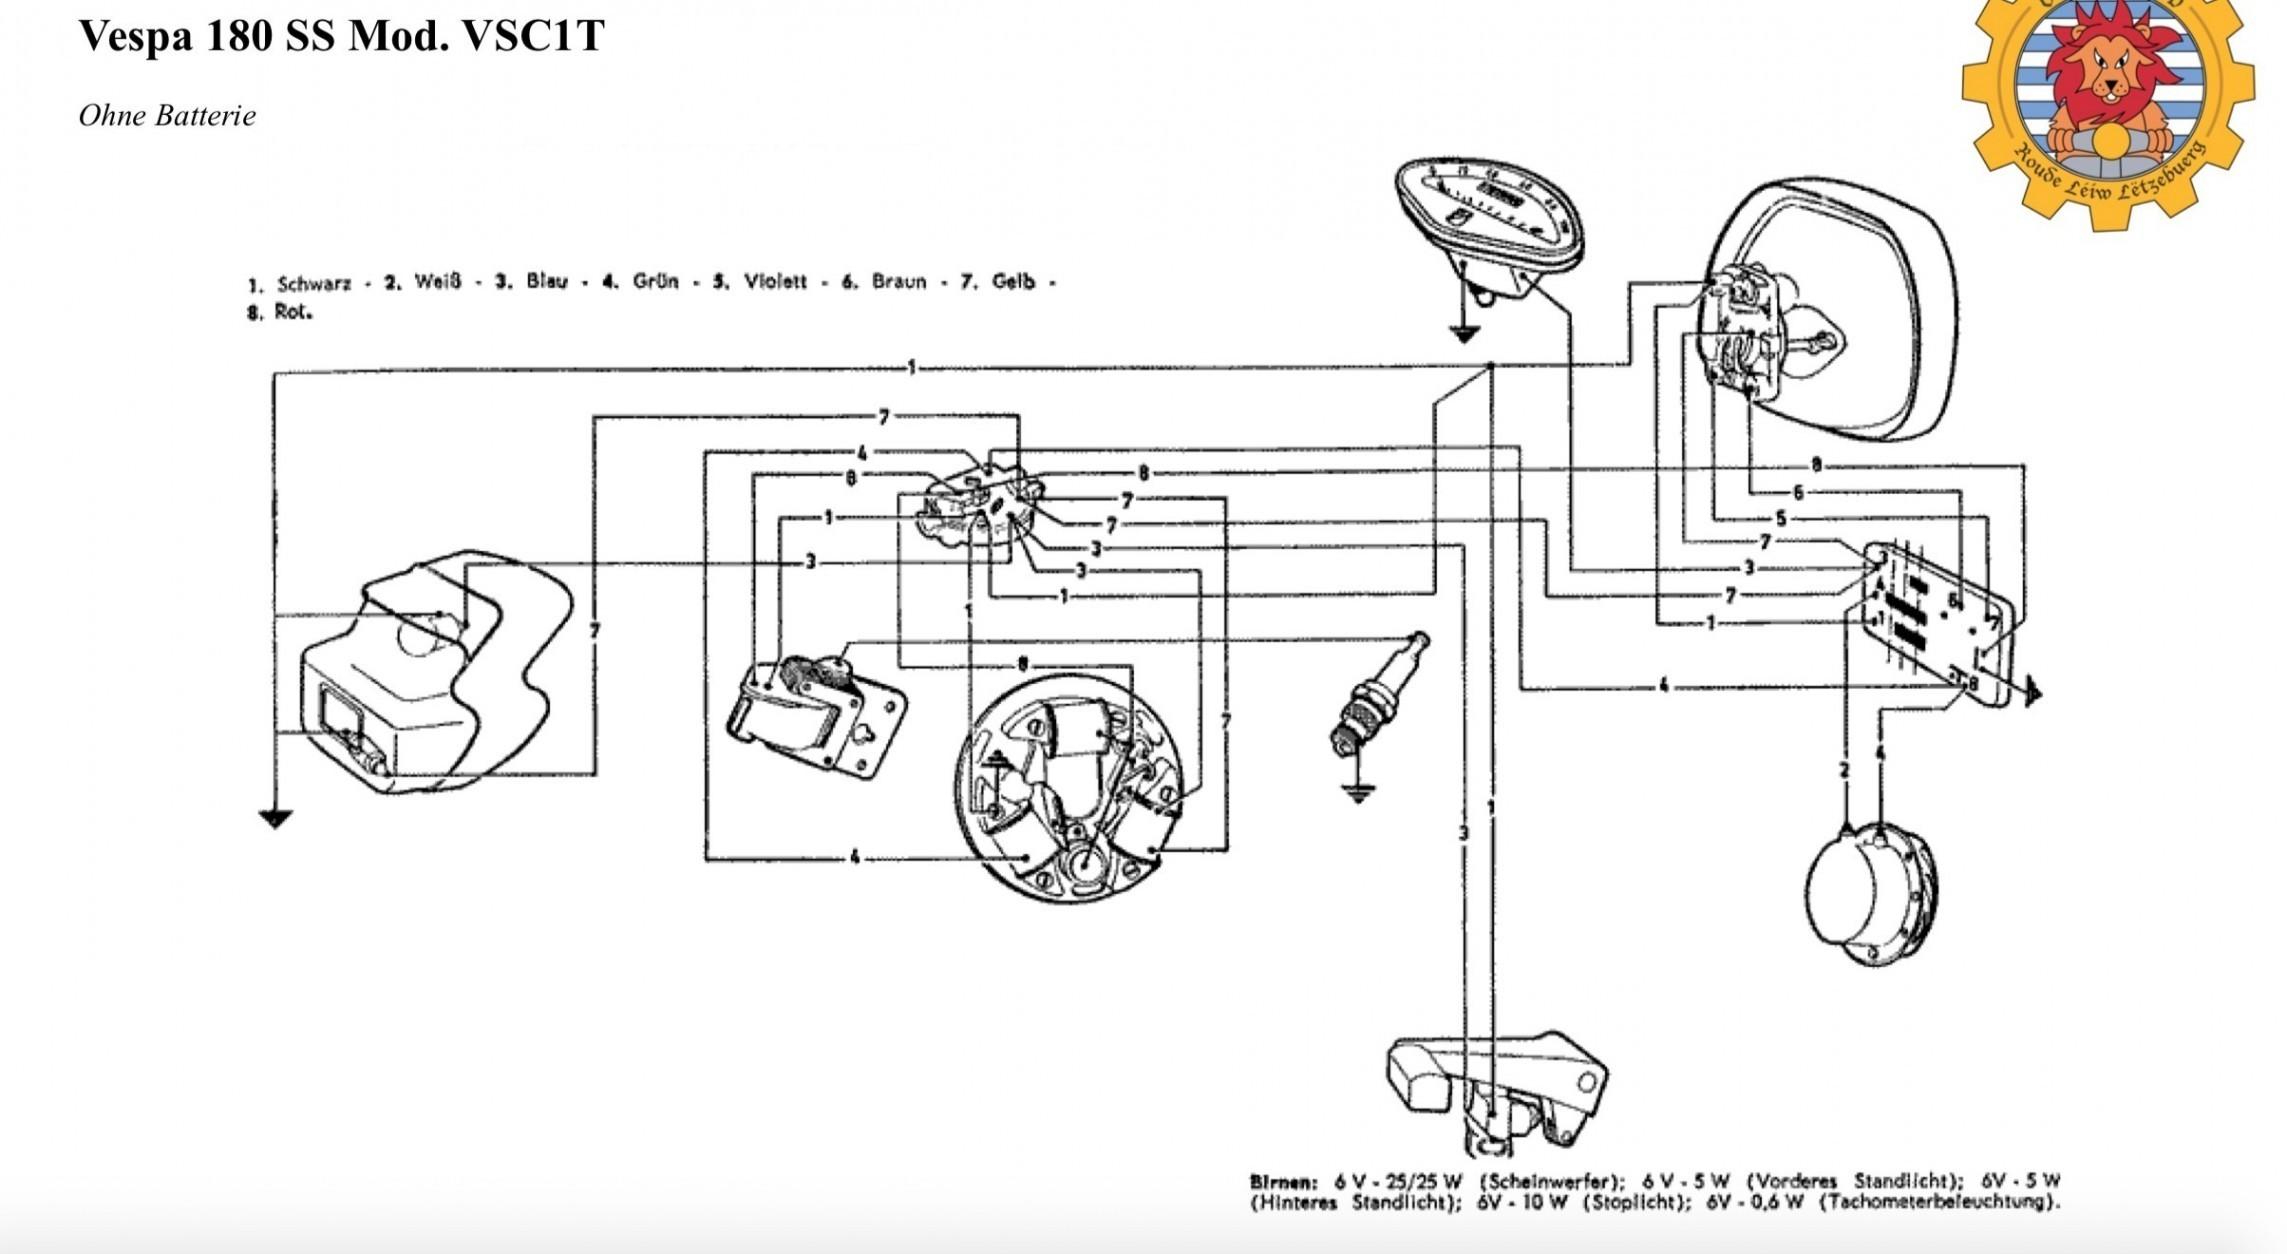 Coolant Temperature Sensor Wiring Diagram Awesome